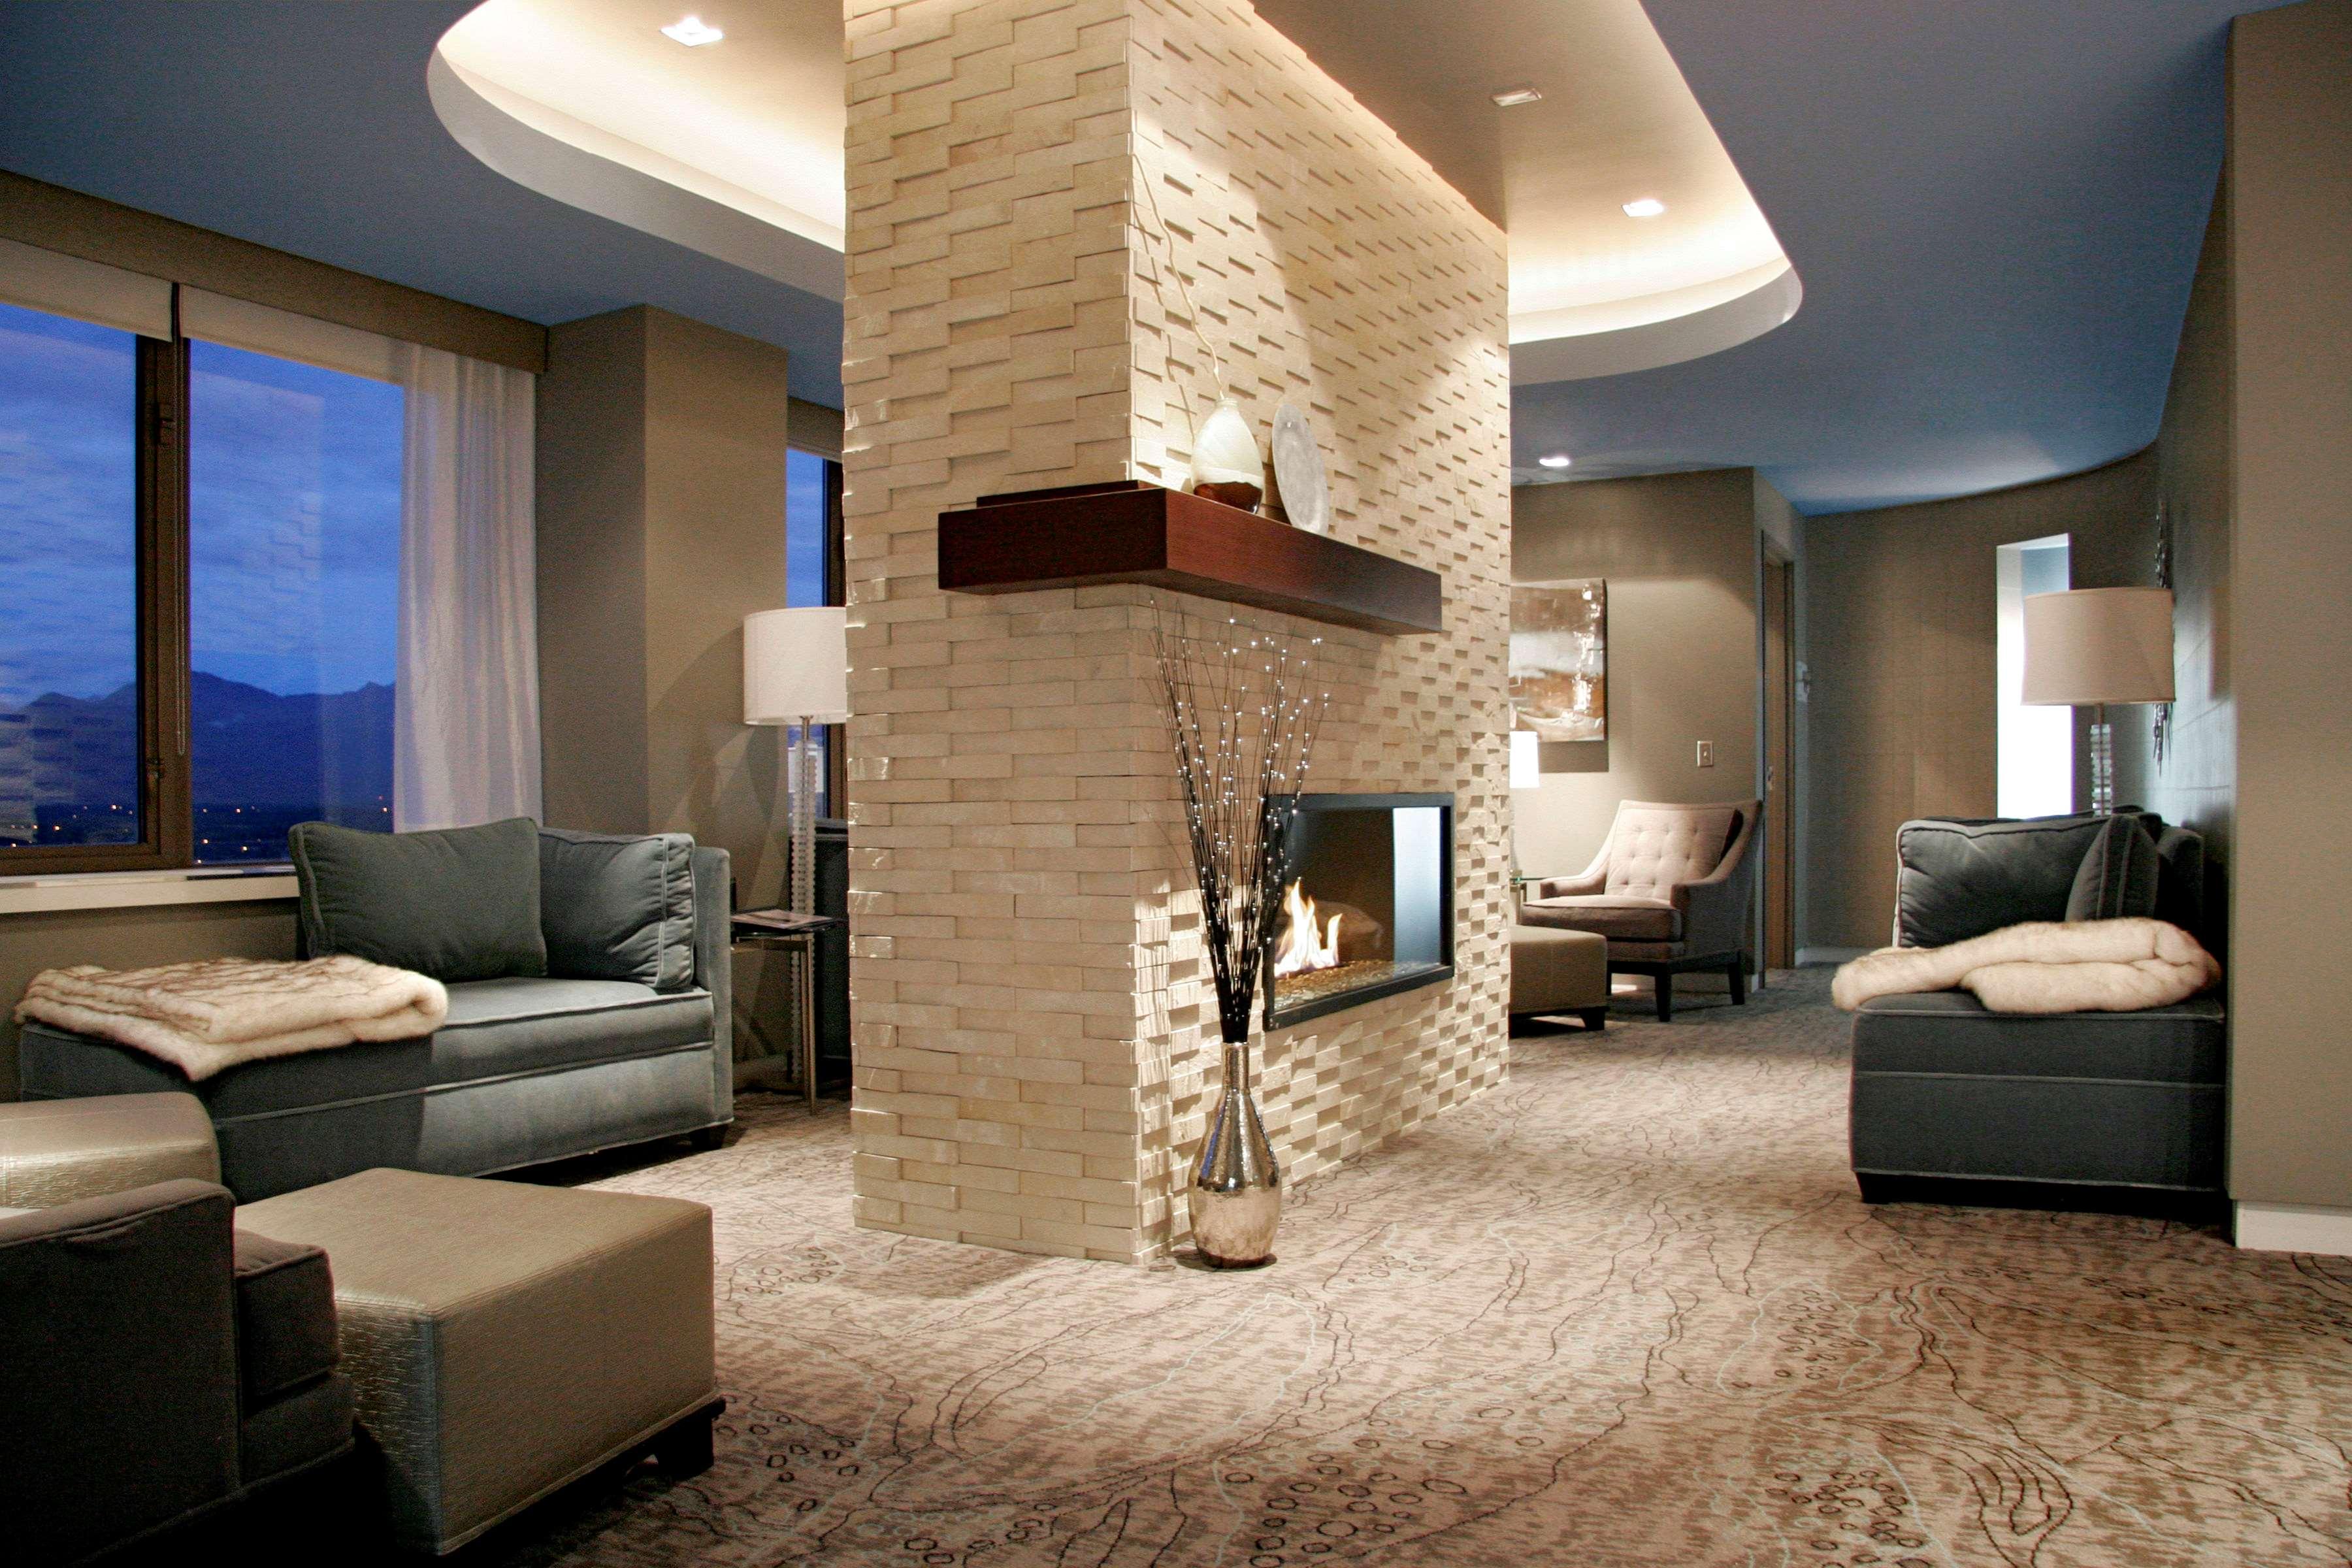 Sheraton Anchorage Hotel & Spa image 17